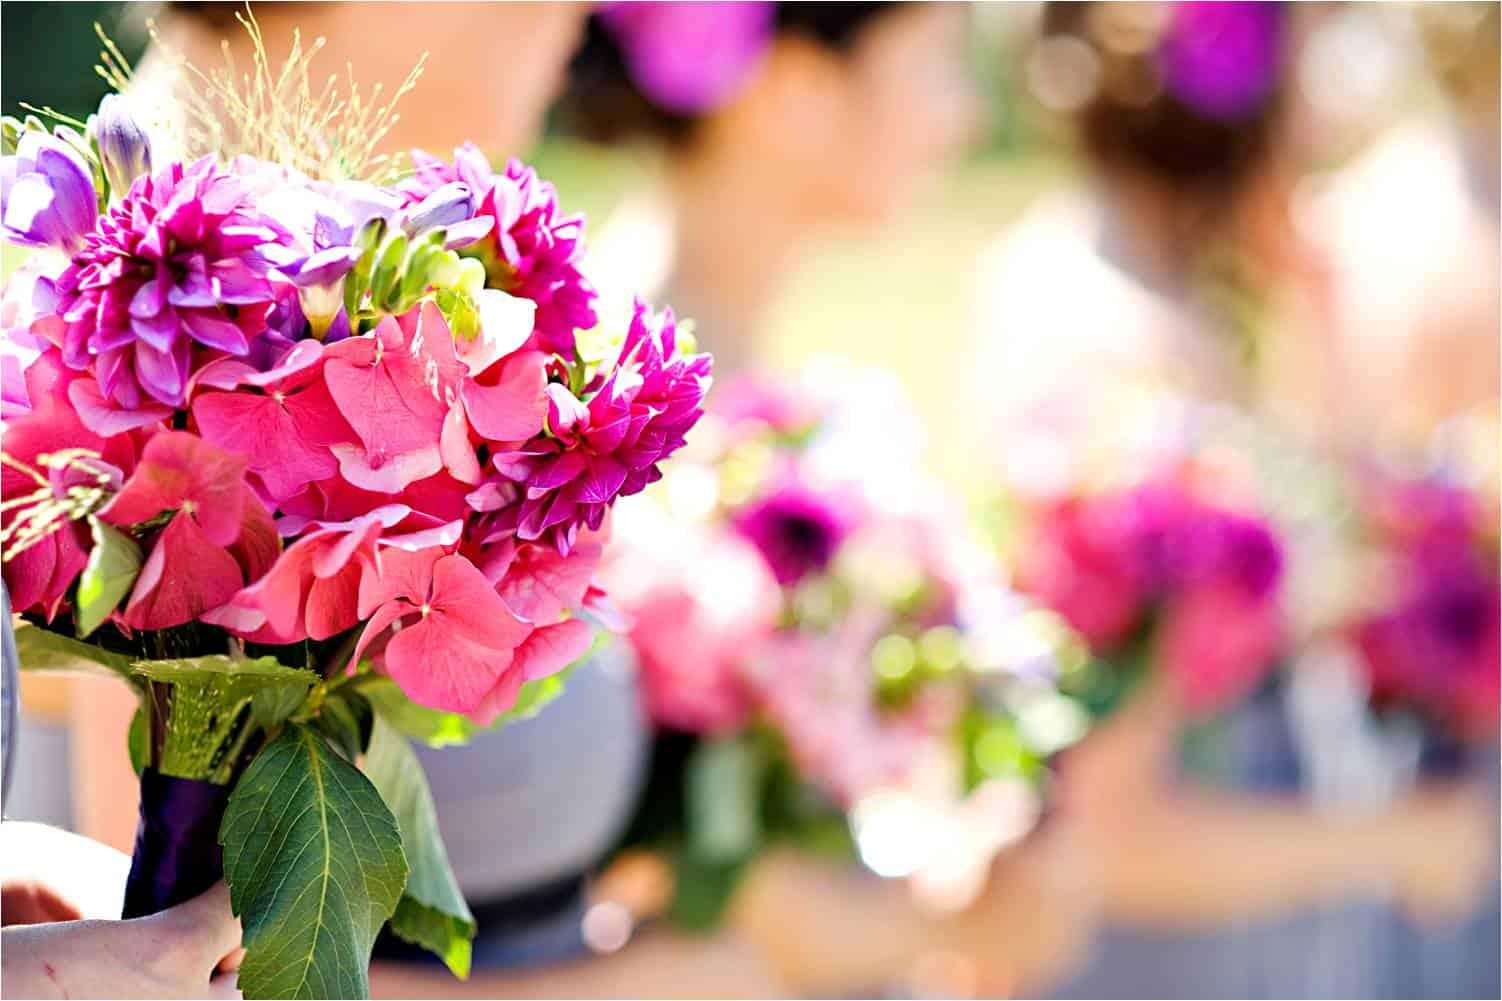 casual-outdoor-wedding-summertime-bright-wedding-flowers-pink_0.original